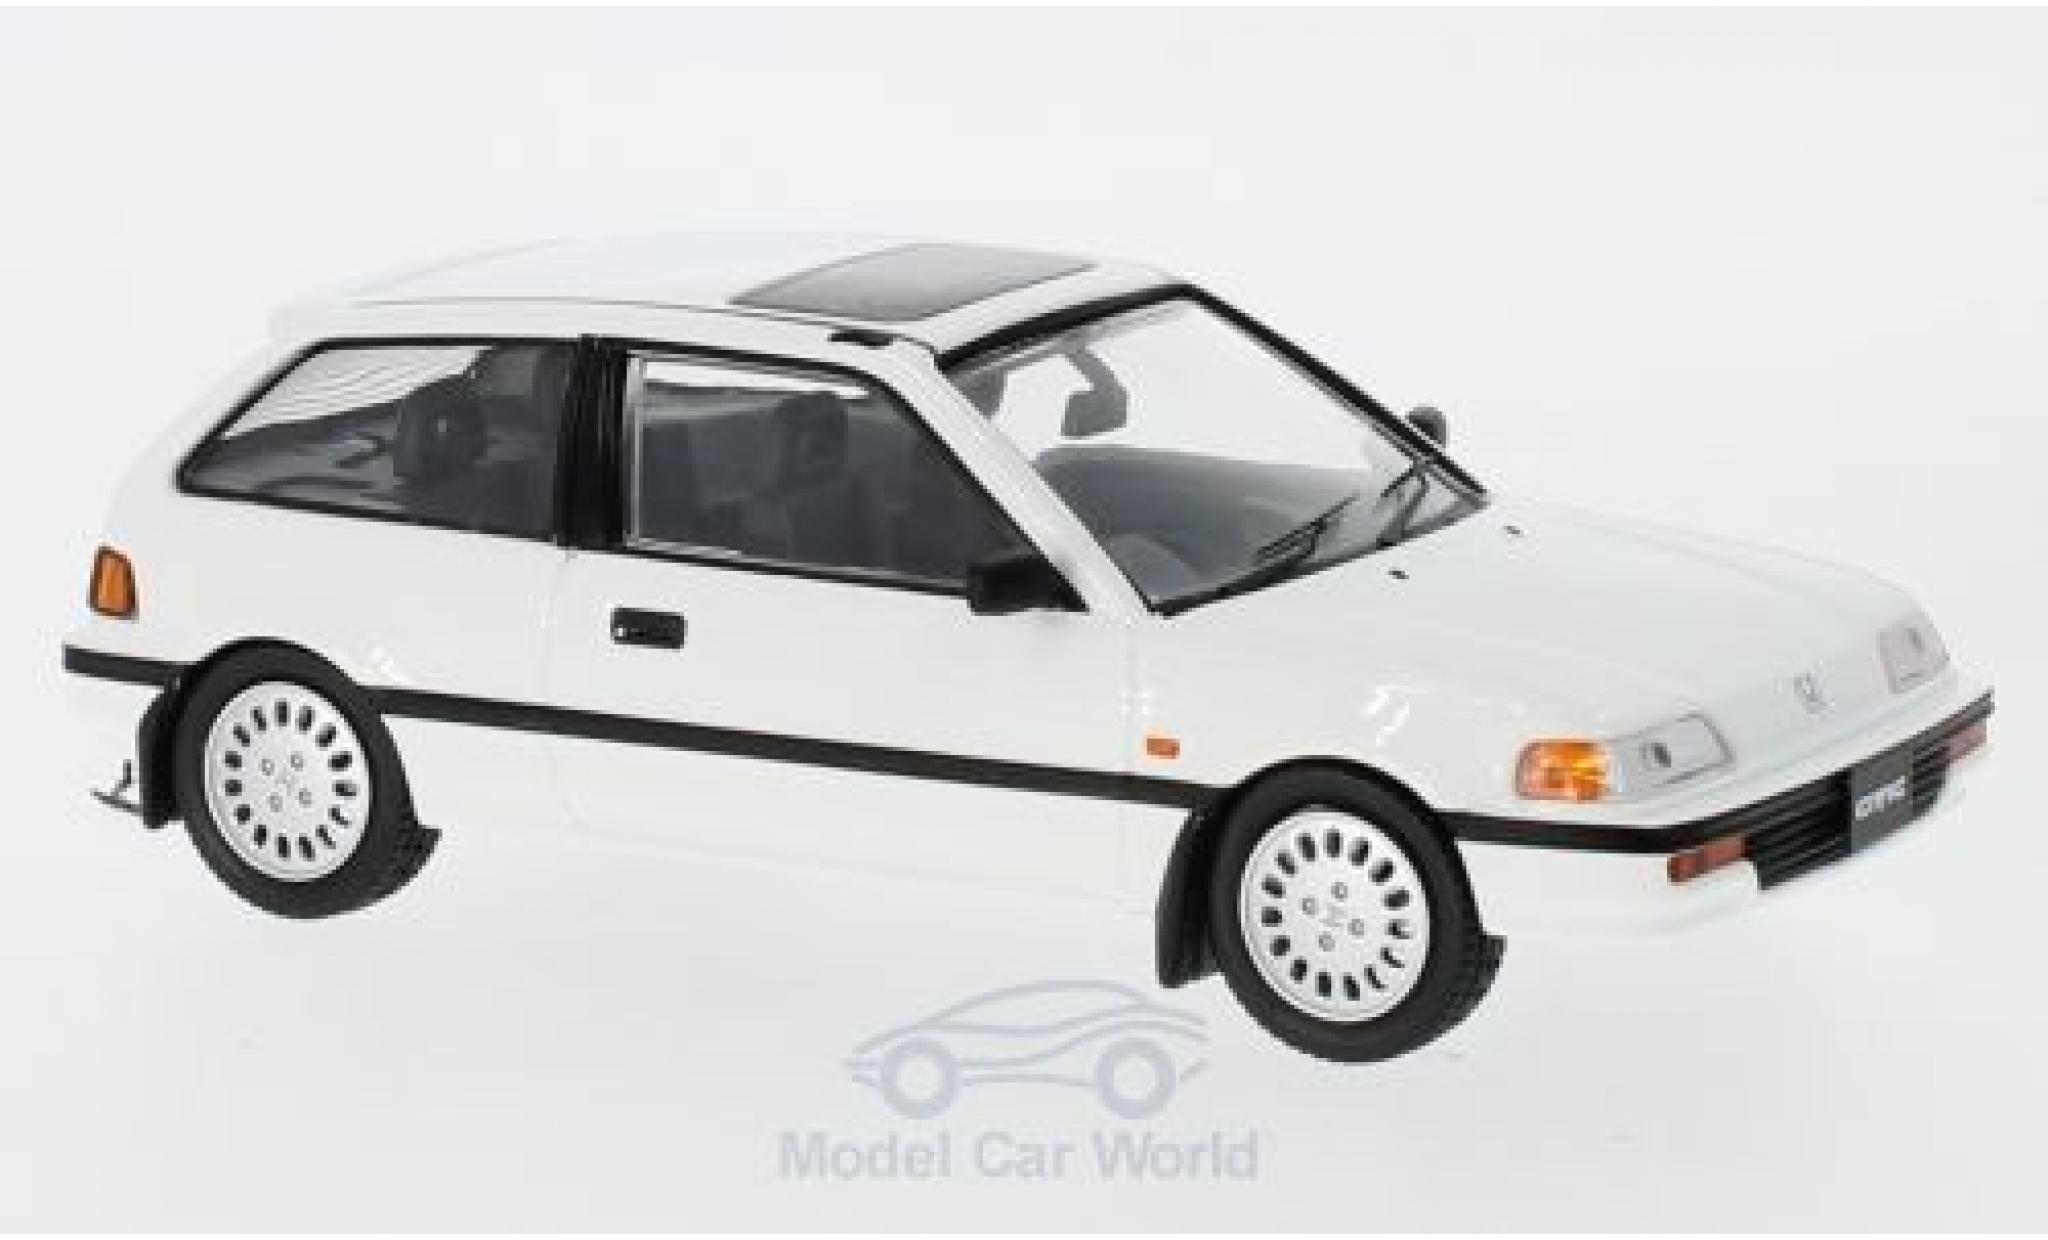 Honda Civic 1/43 First 43 Models white RHD 1987